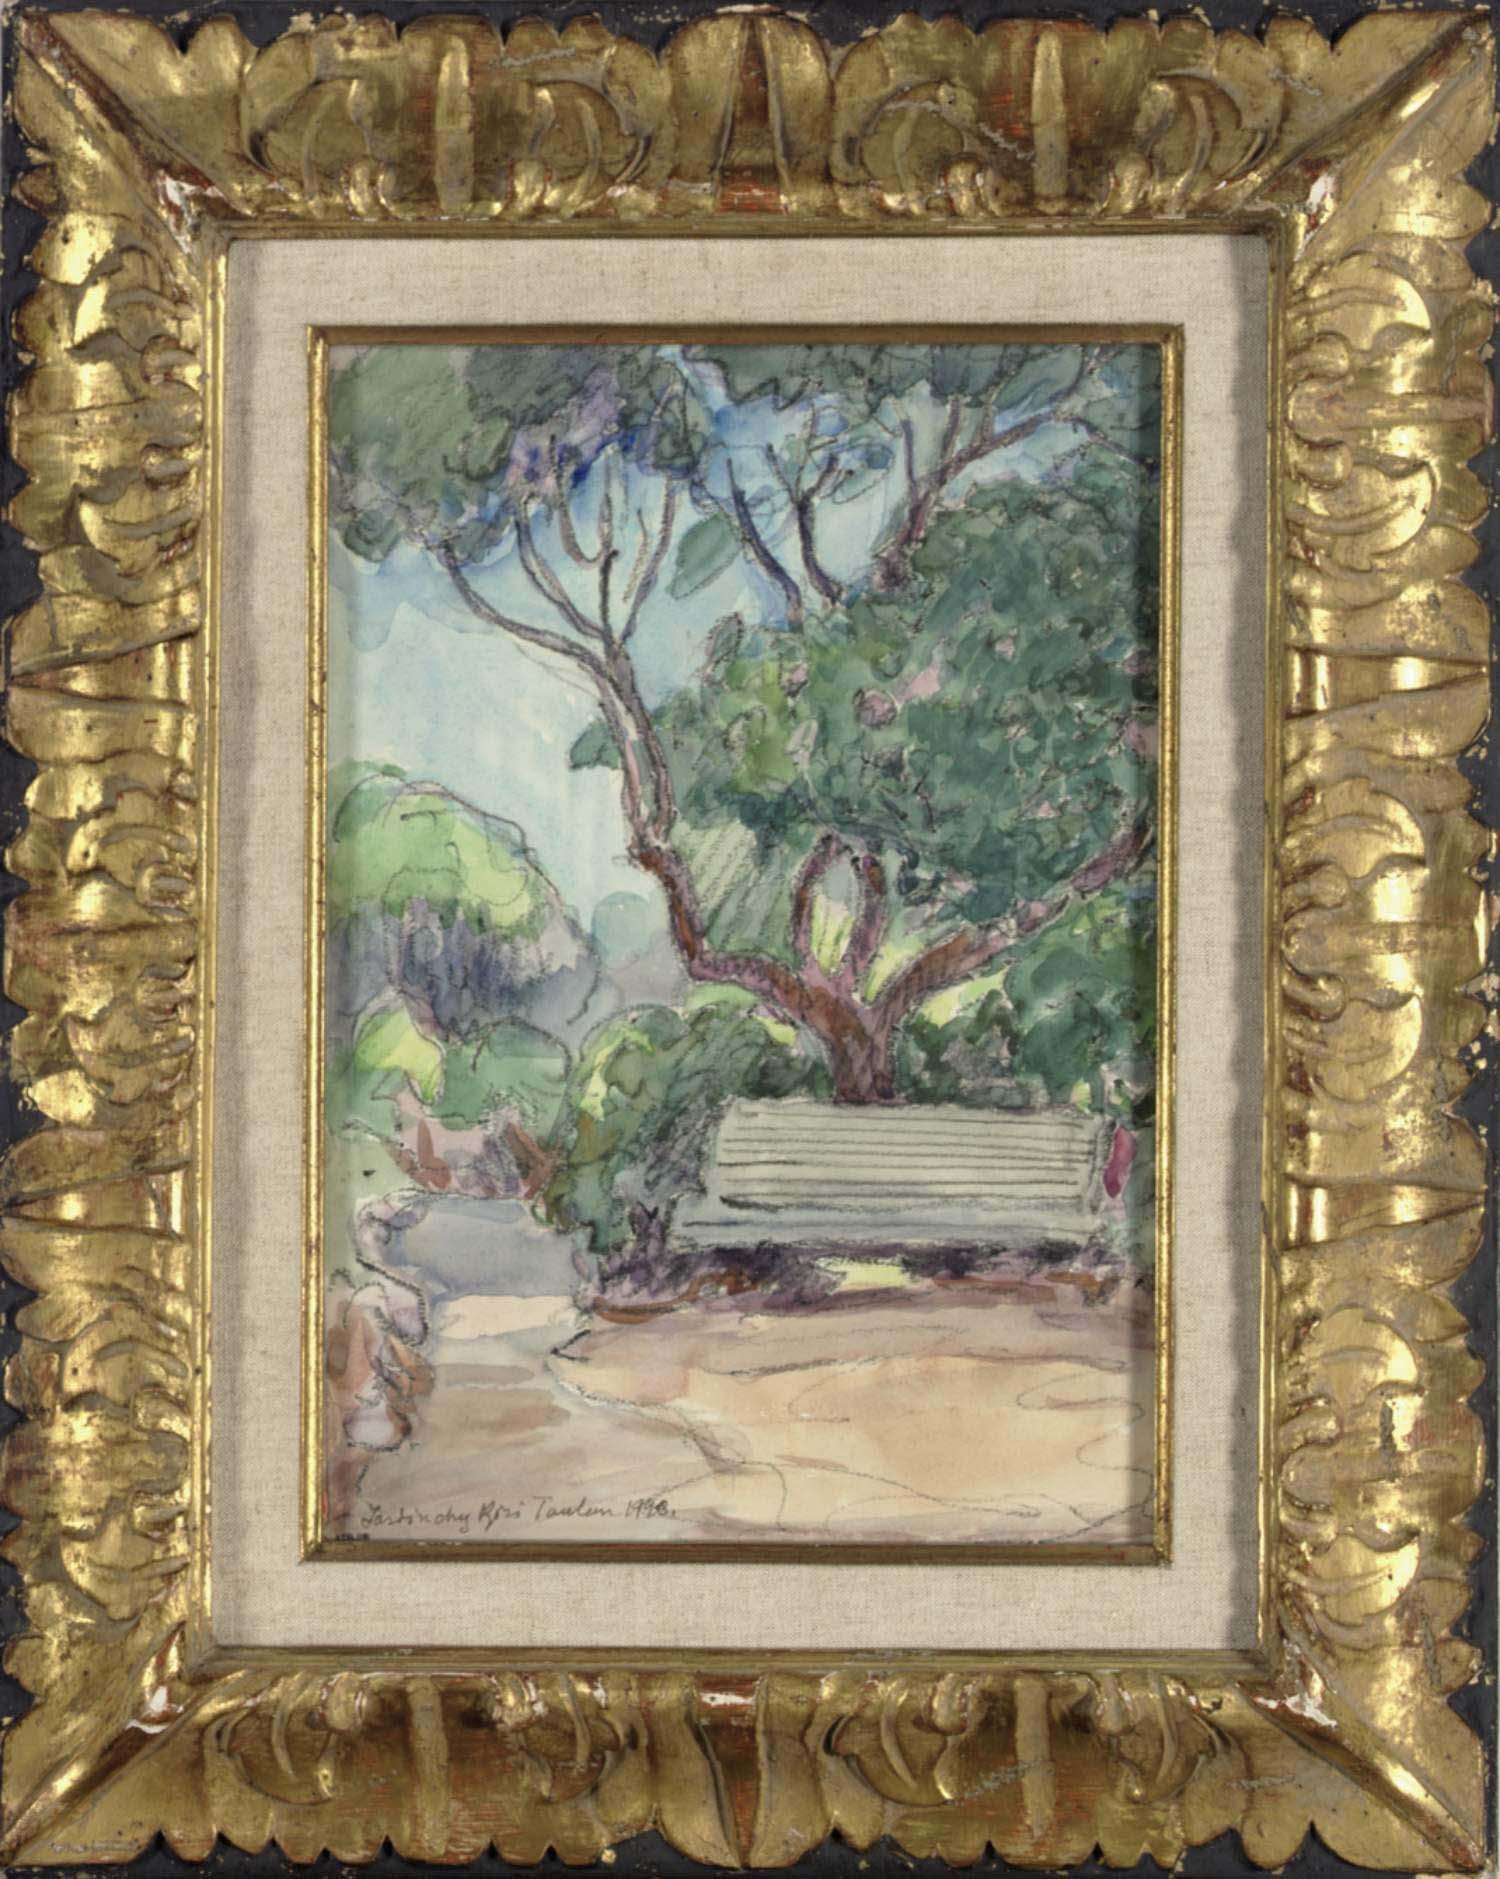 Jardin chez Rosi, Toulon